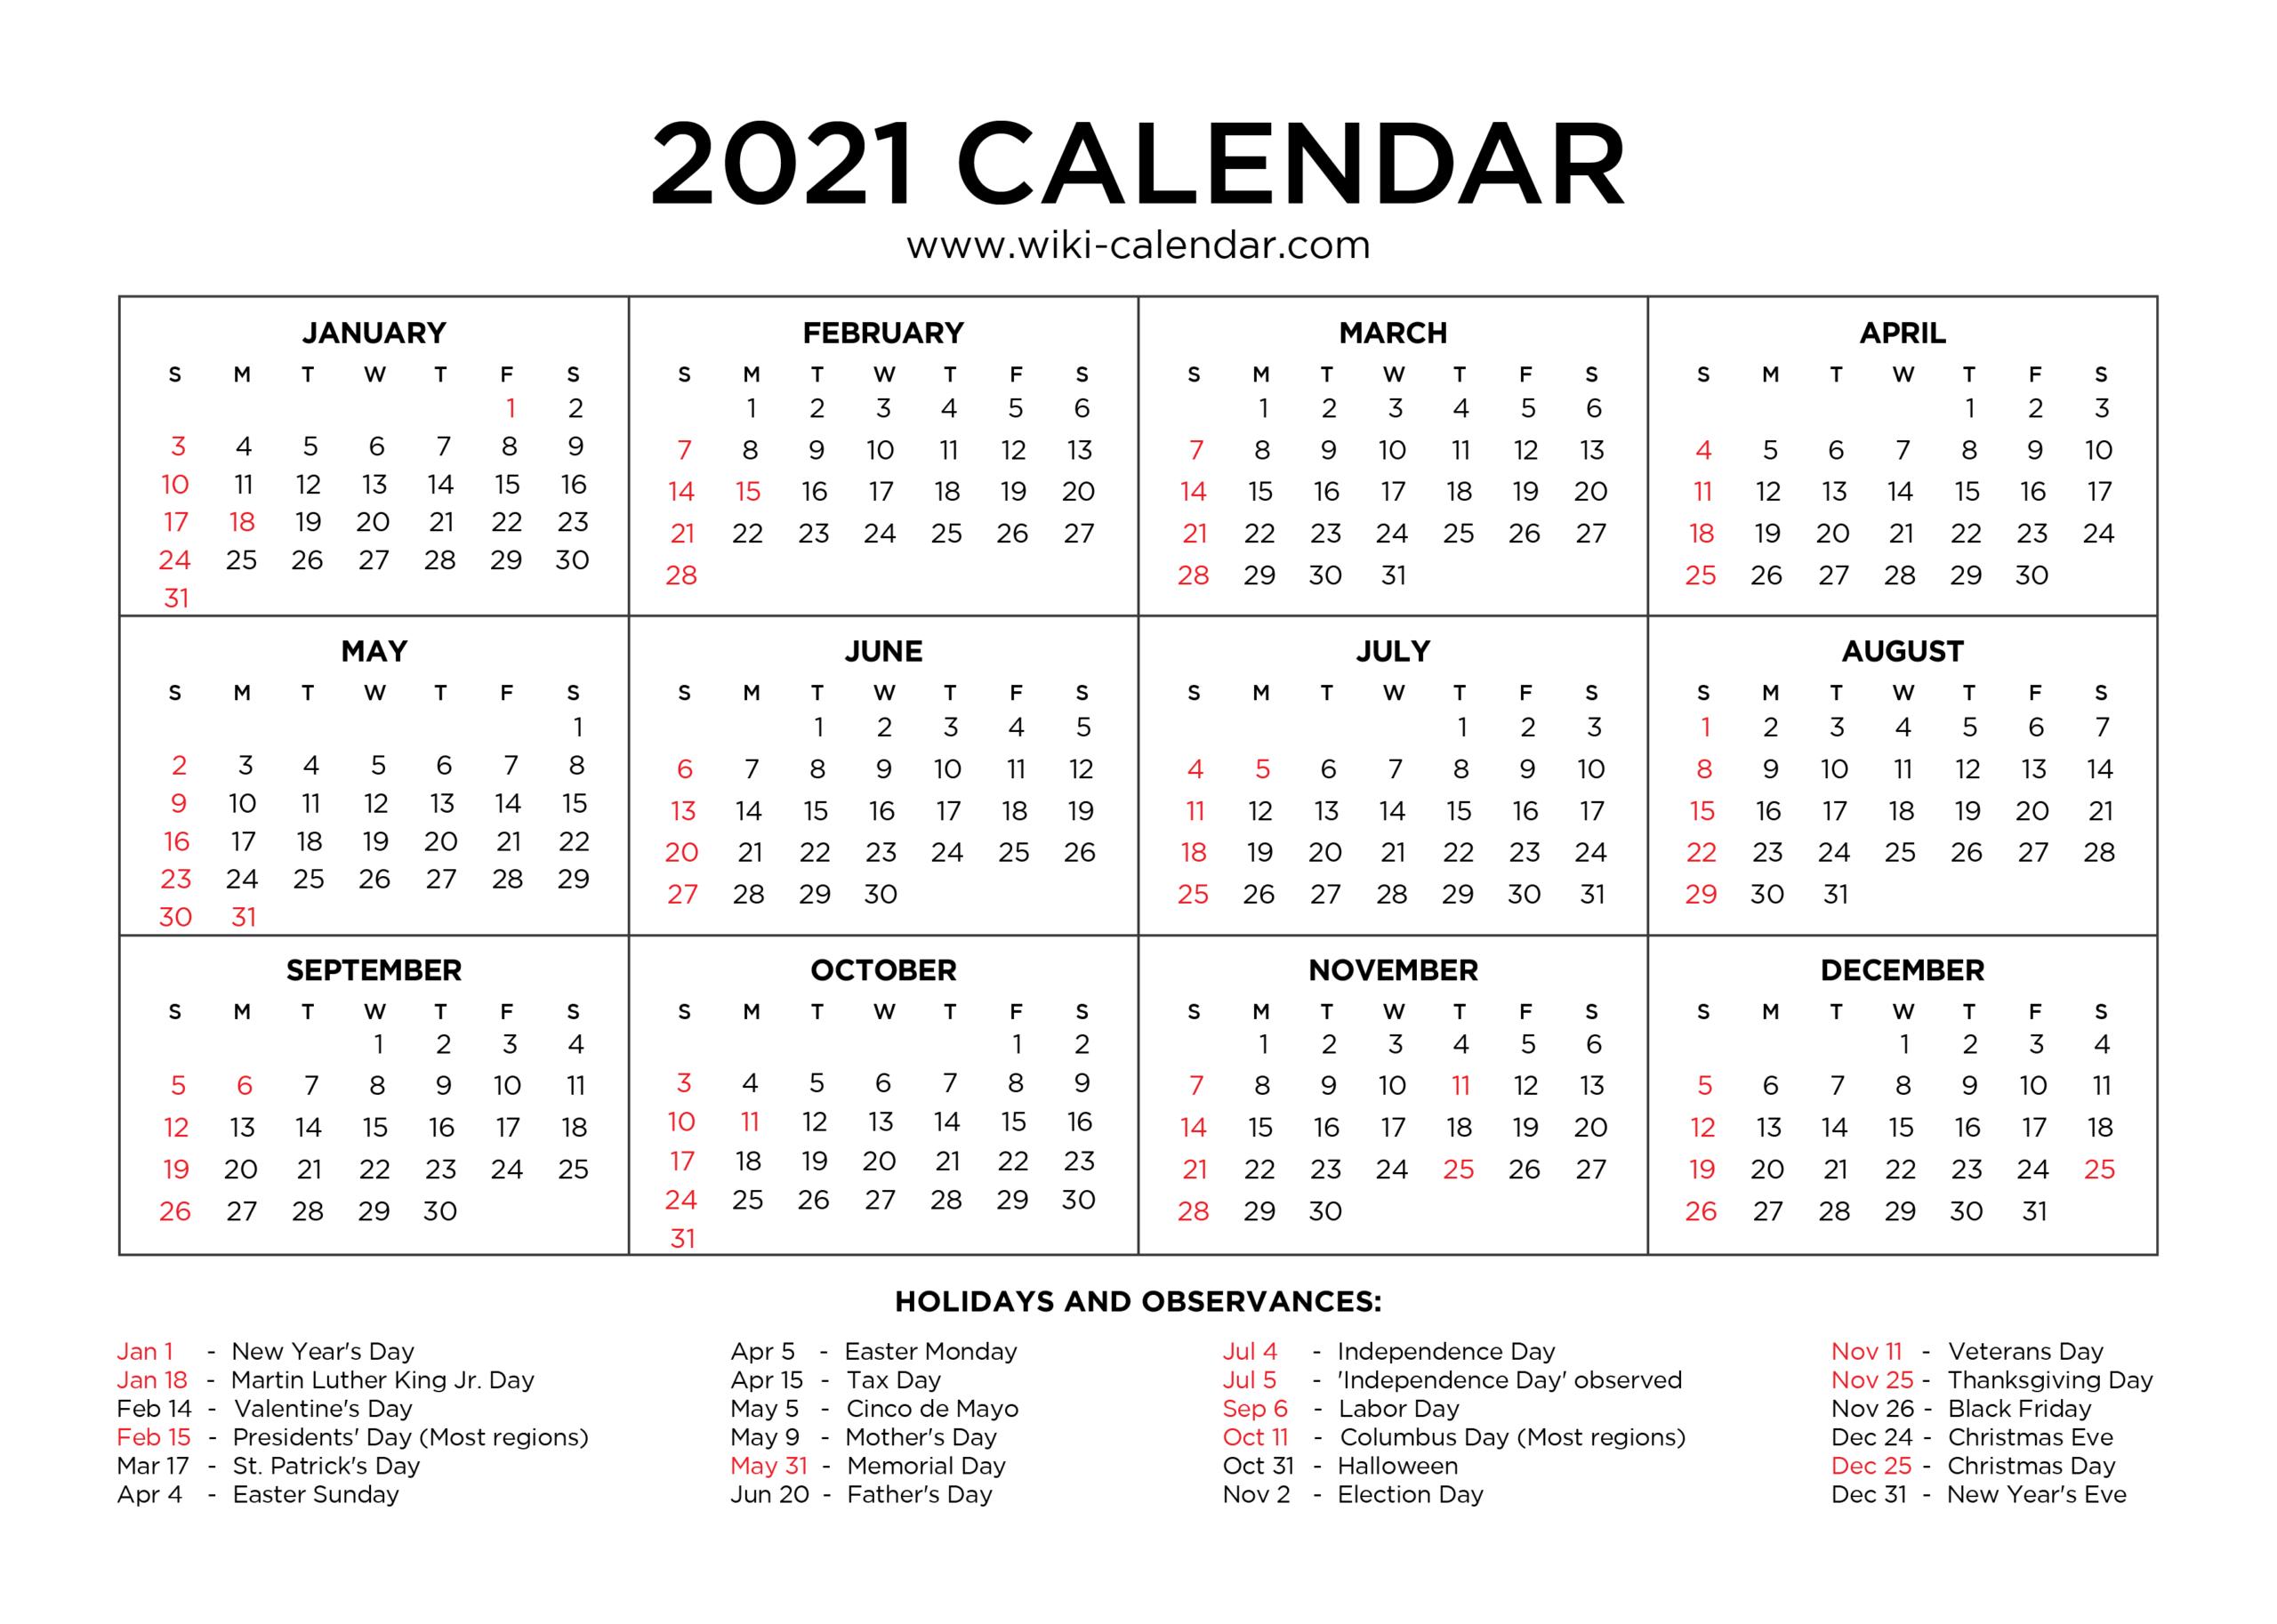 Free Printable Year 2021 Calendar With Holidays